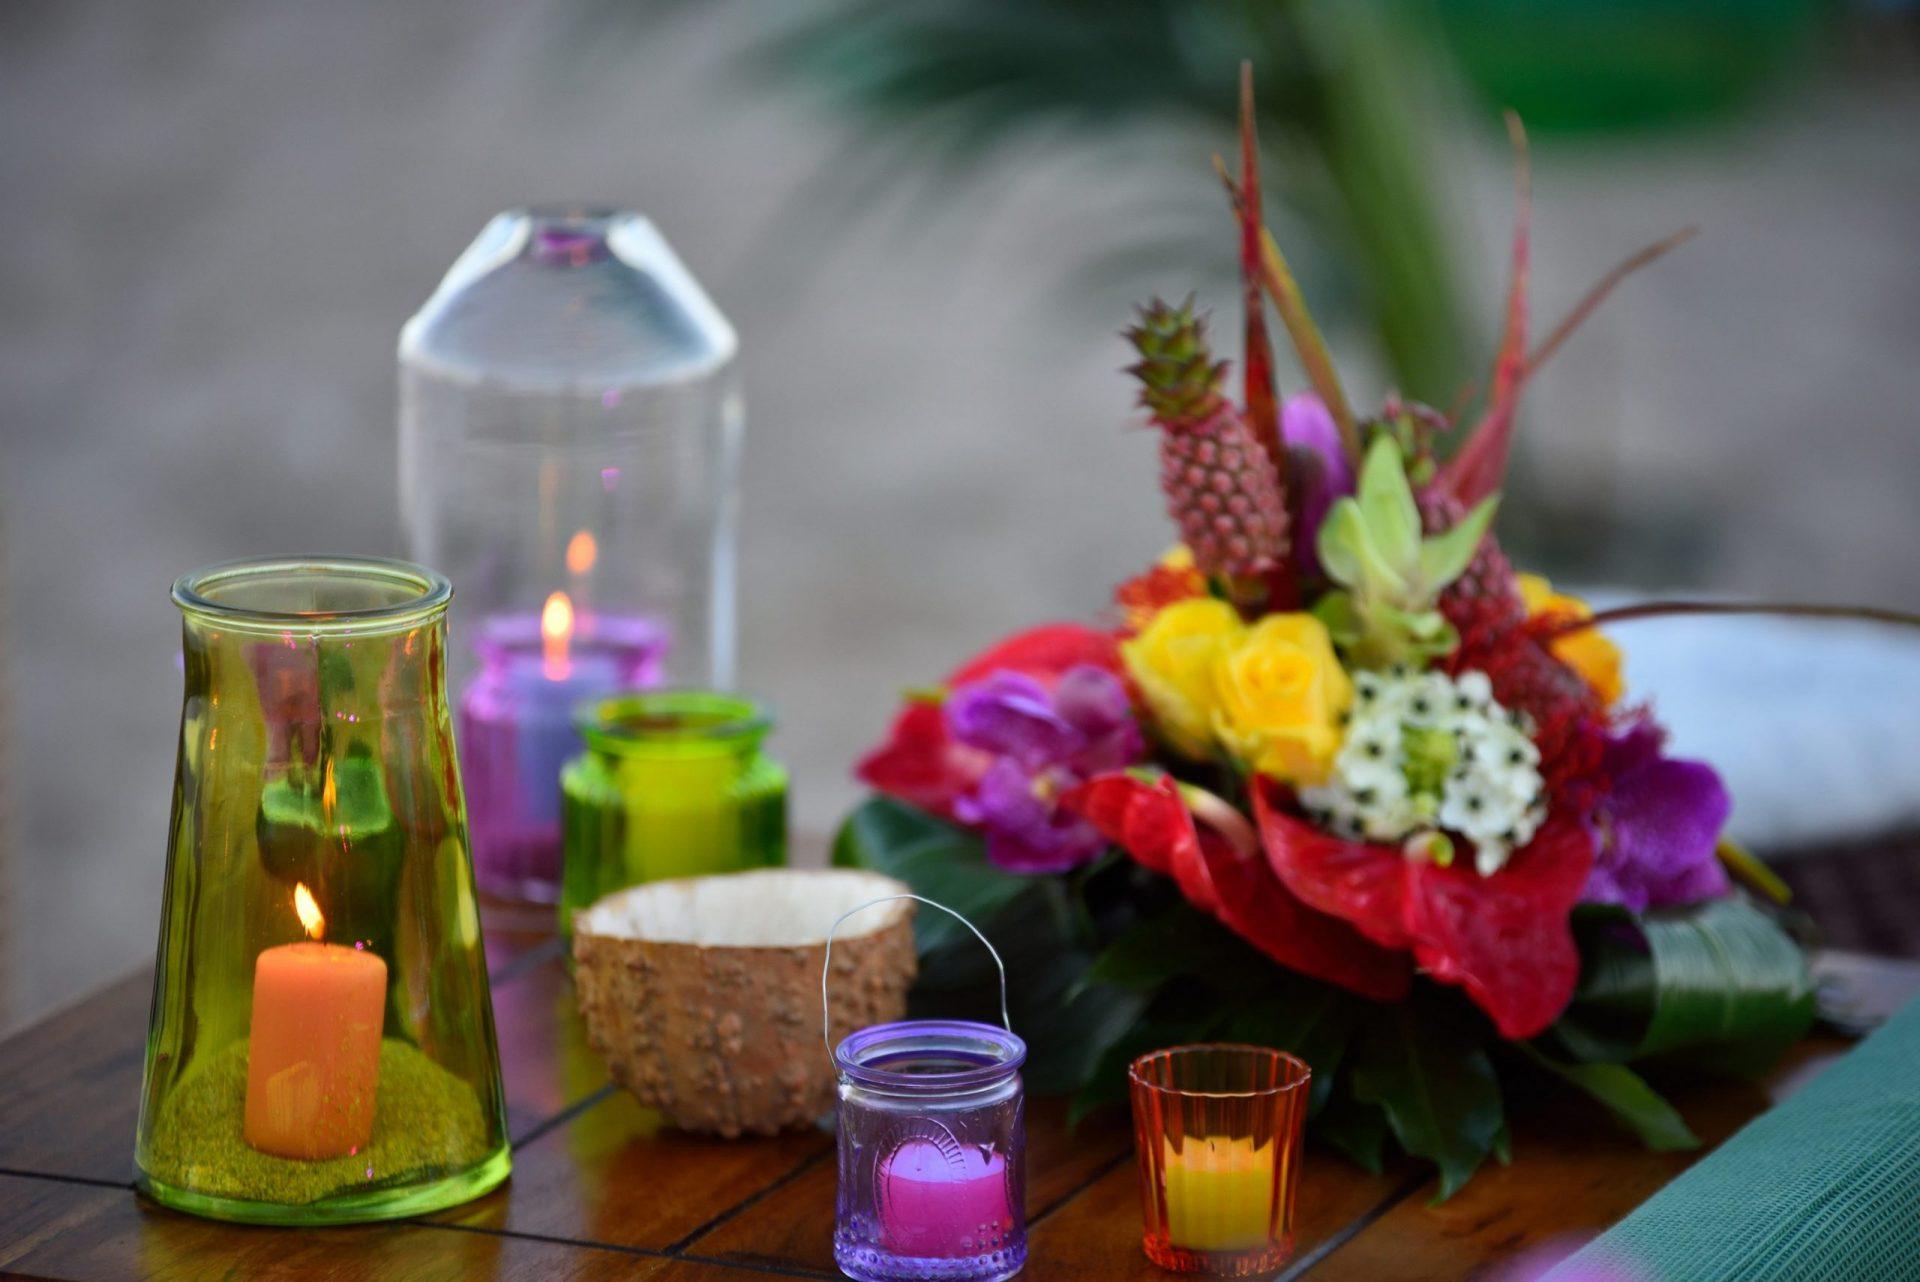 Tropical party in Porto Cervo, decor details